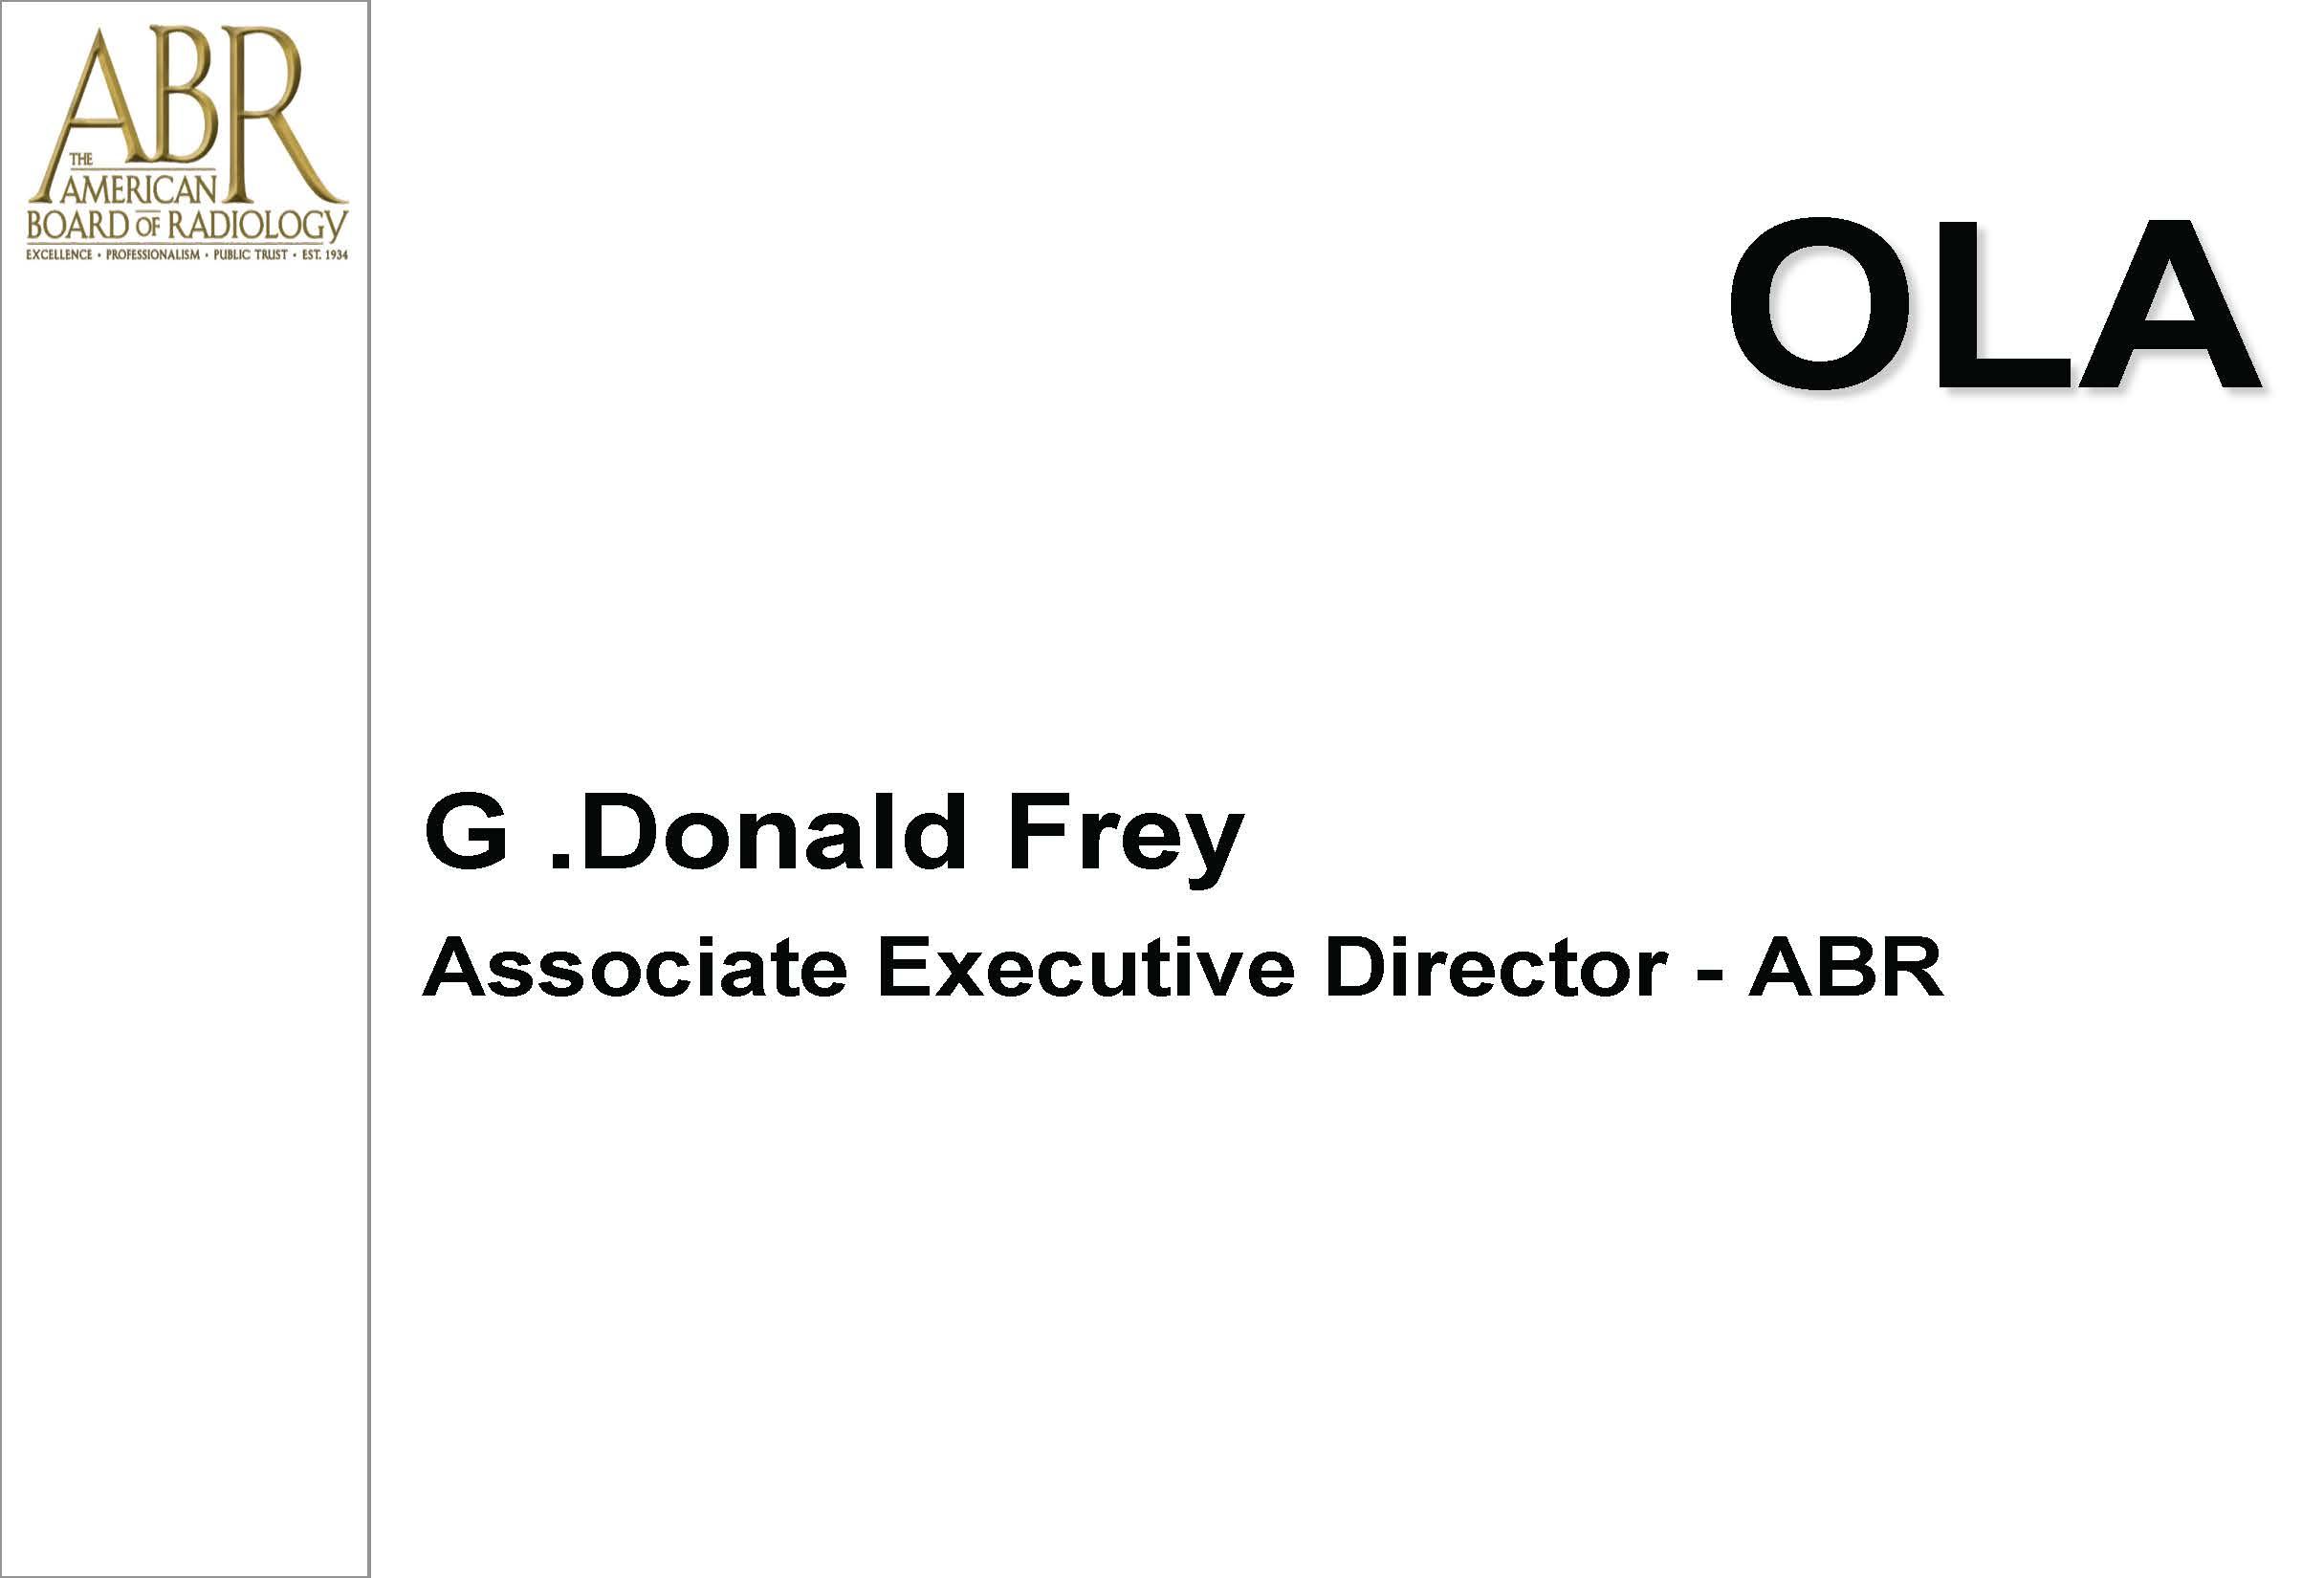 Aapm Vl The American Board Of Radiology Maintenance Of Certification